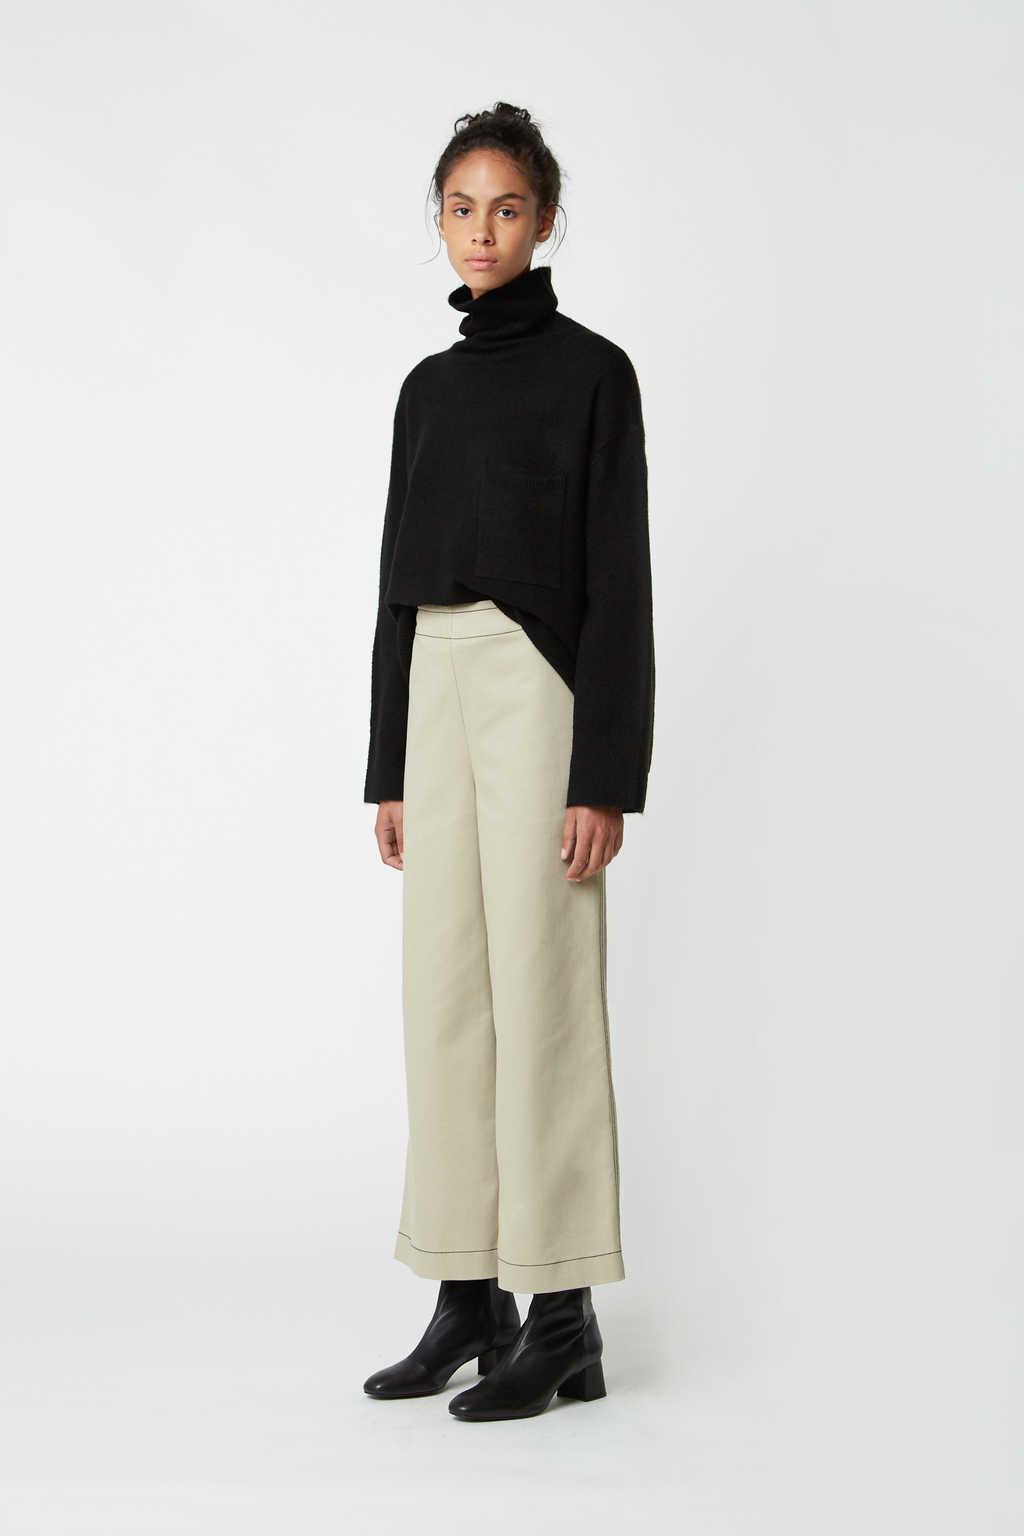 Sweater 2406 Black 7